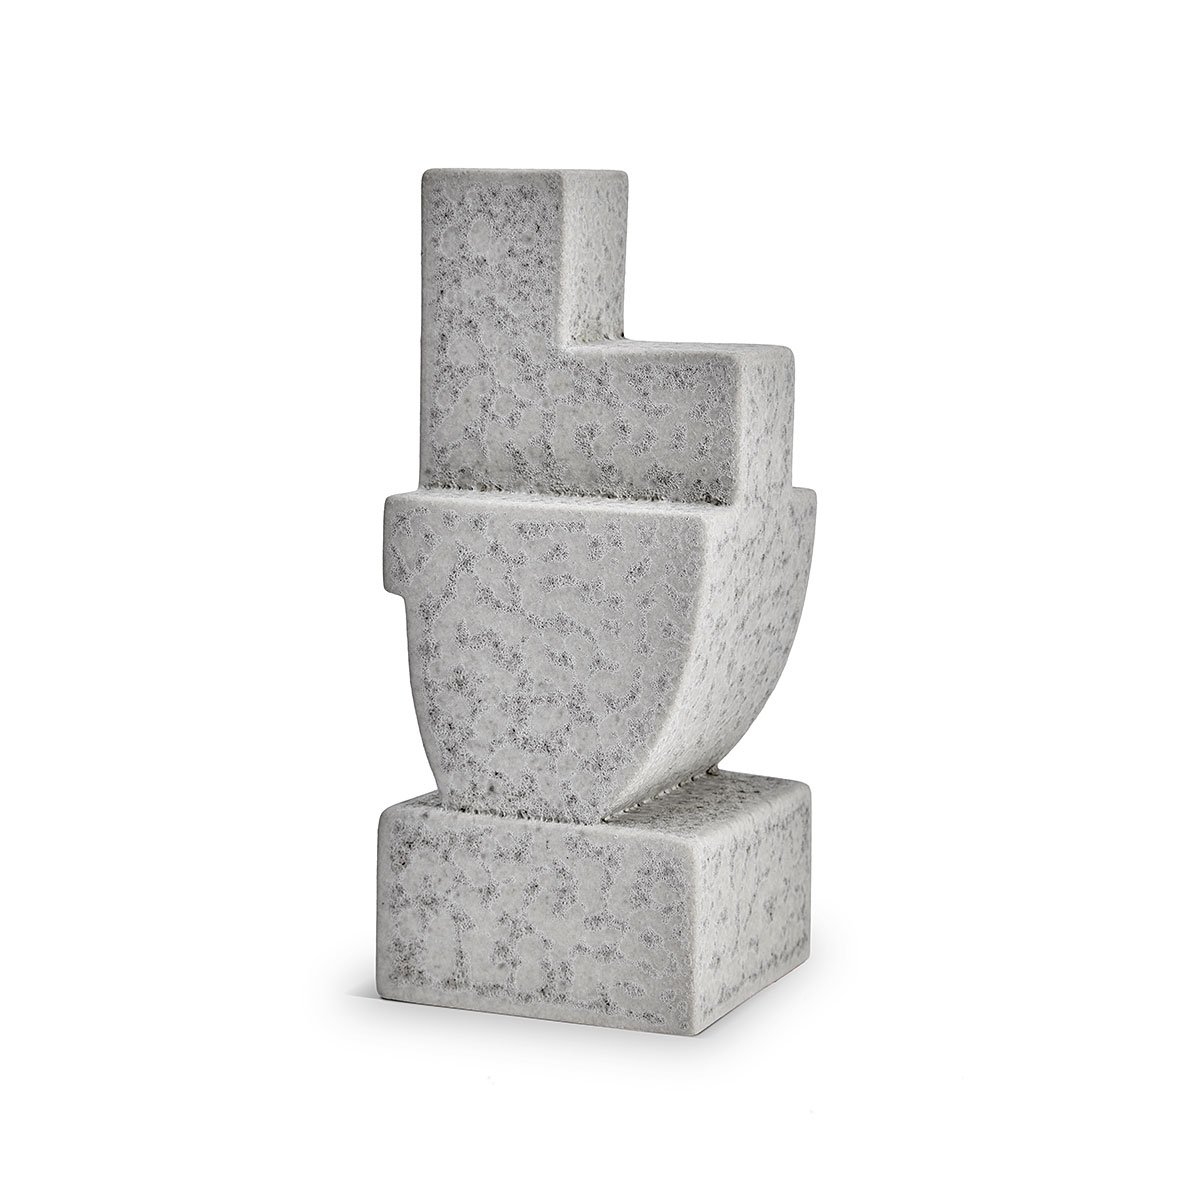 image-Cubisme Bookend Grey